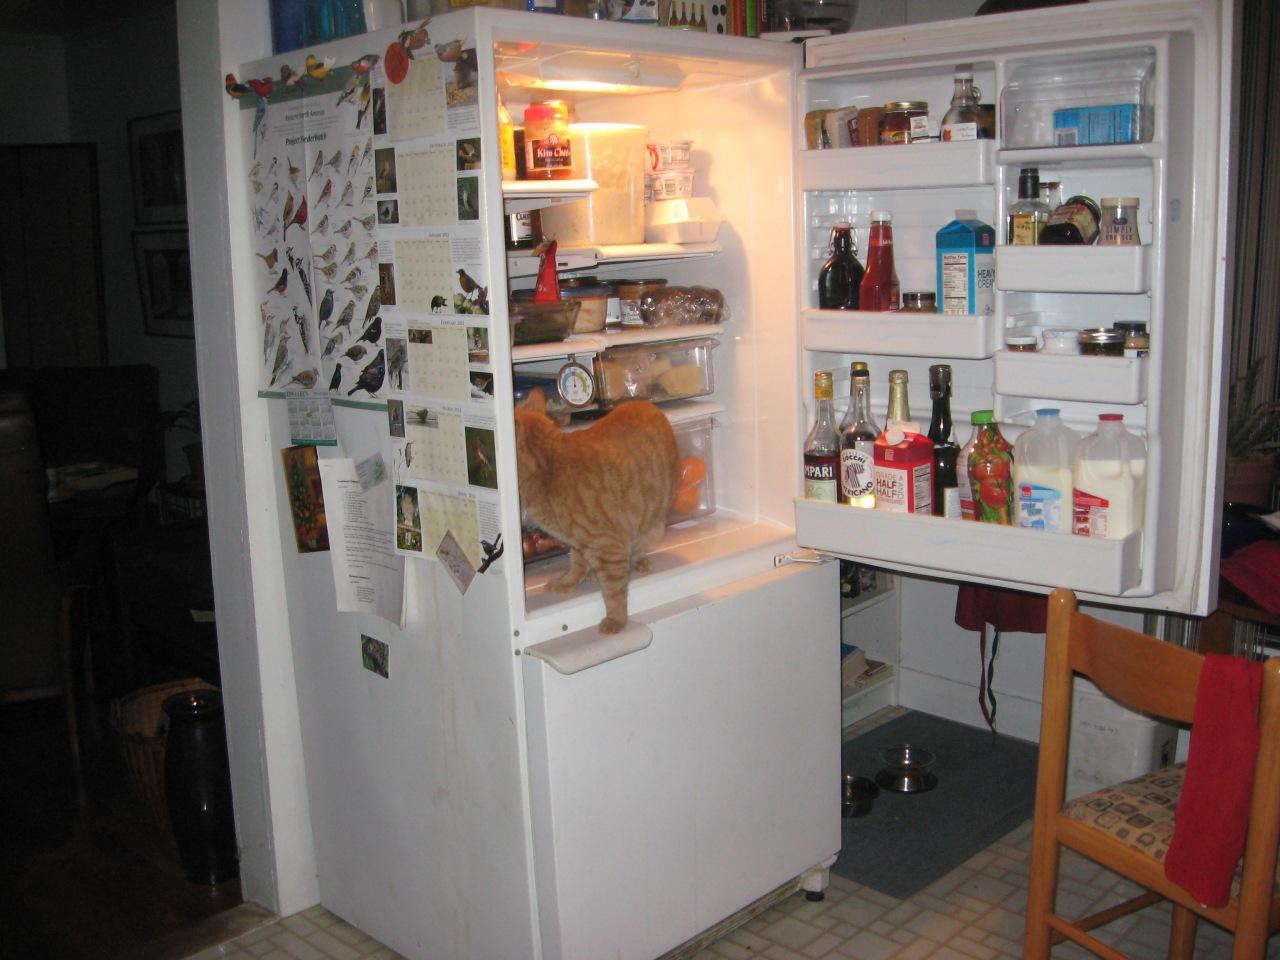 cat in refrigerator